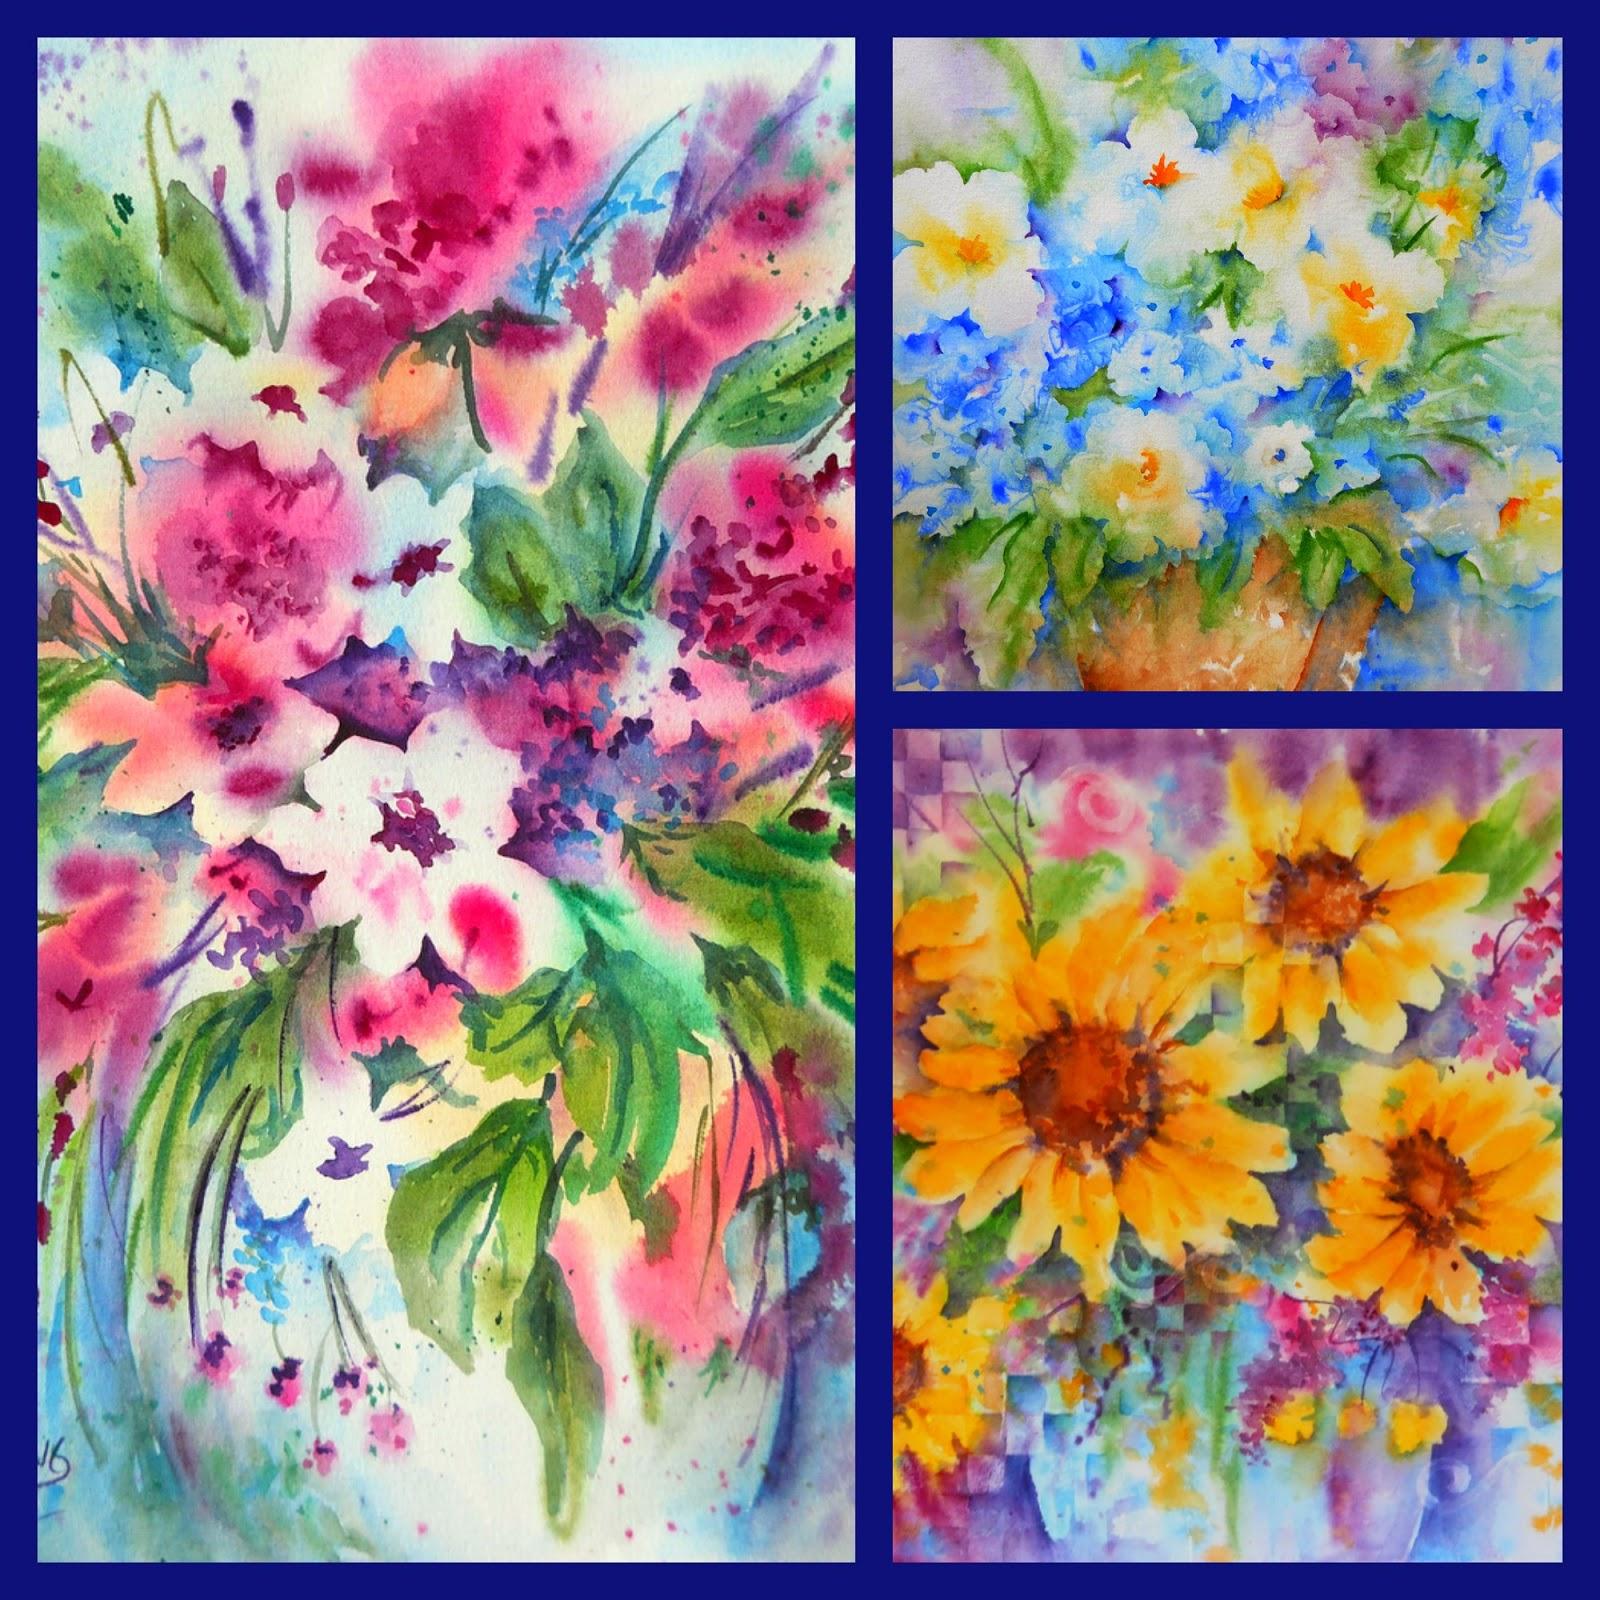 Martha kisling art with heart creative watercolor 2014 flowers creative watercolor 2014 flowers in january izmirmasajfo